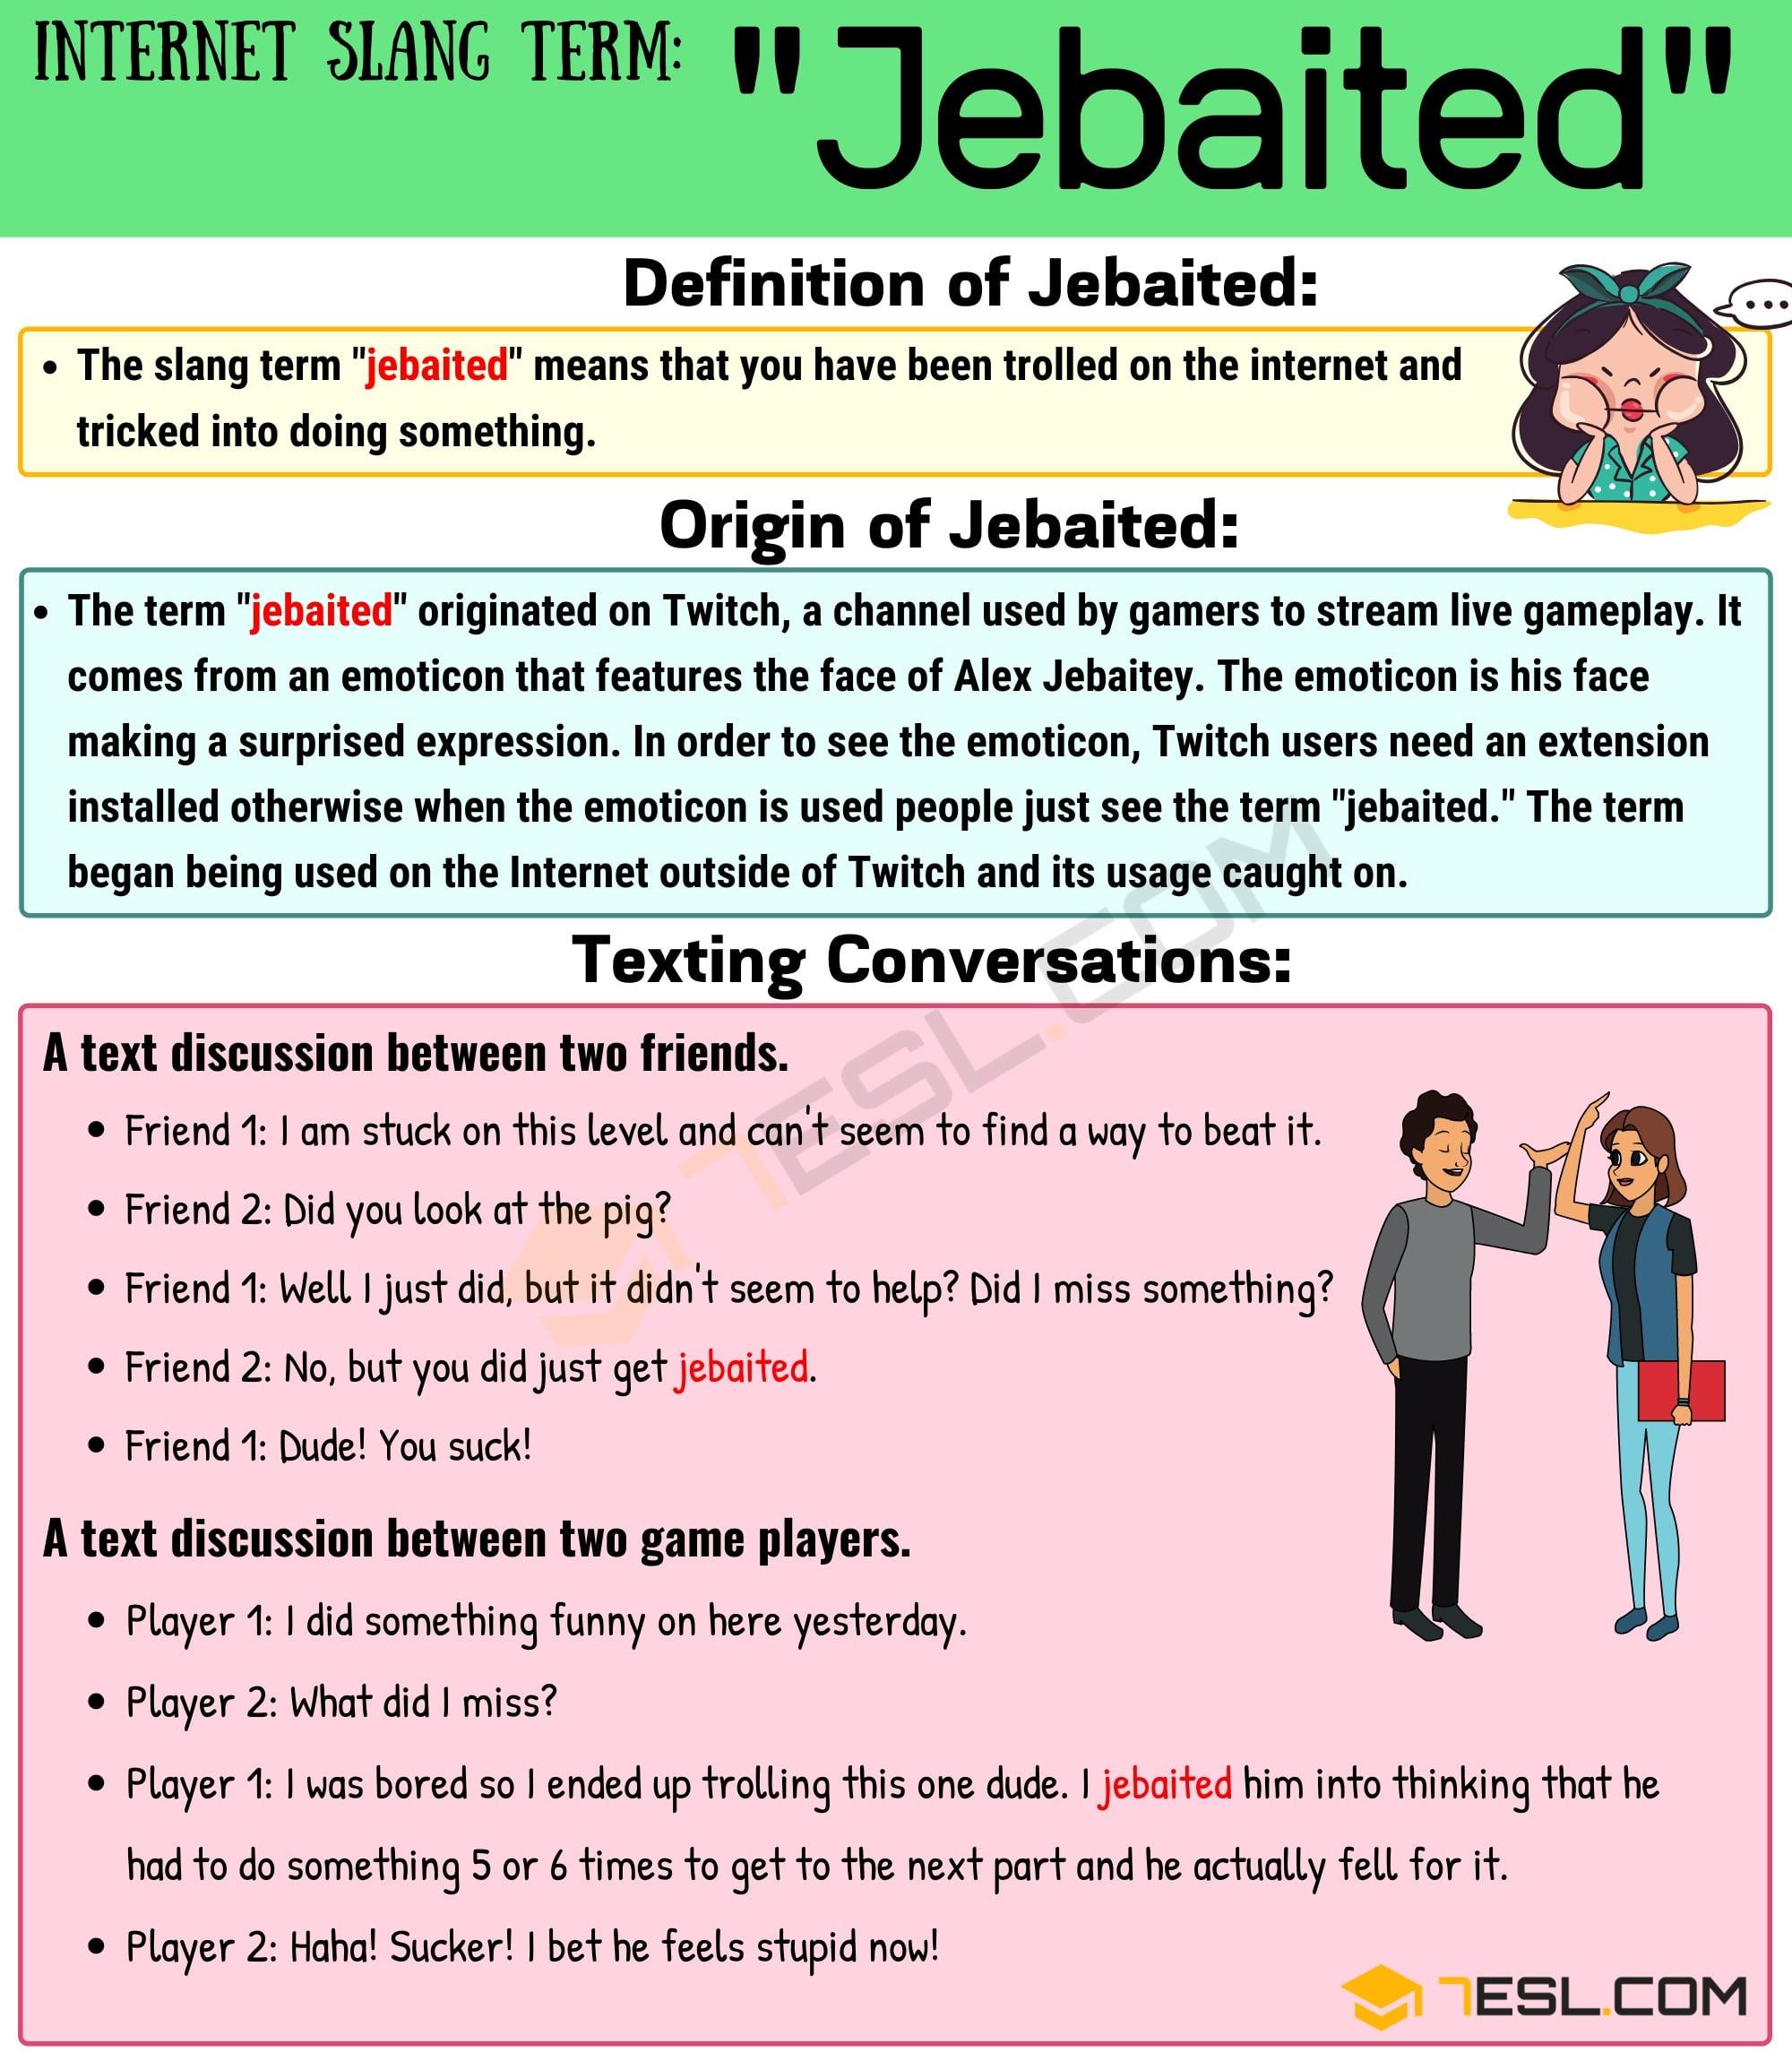 Jebaited